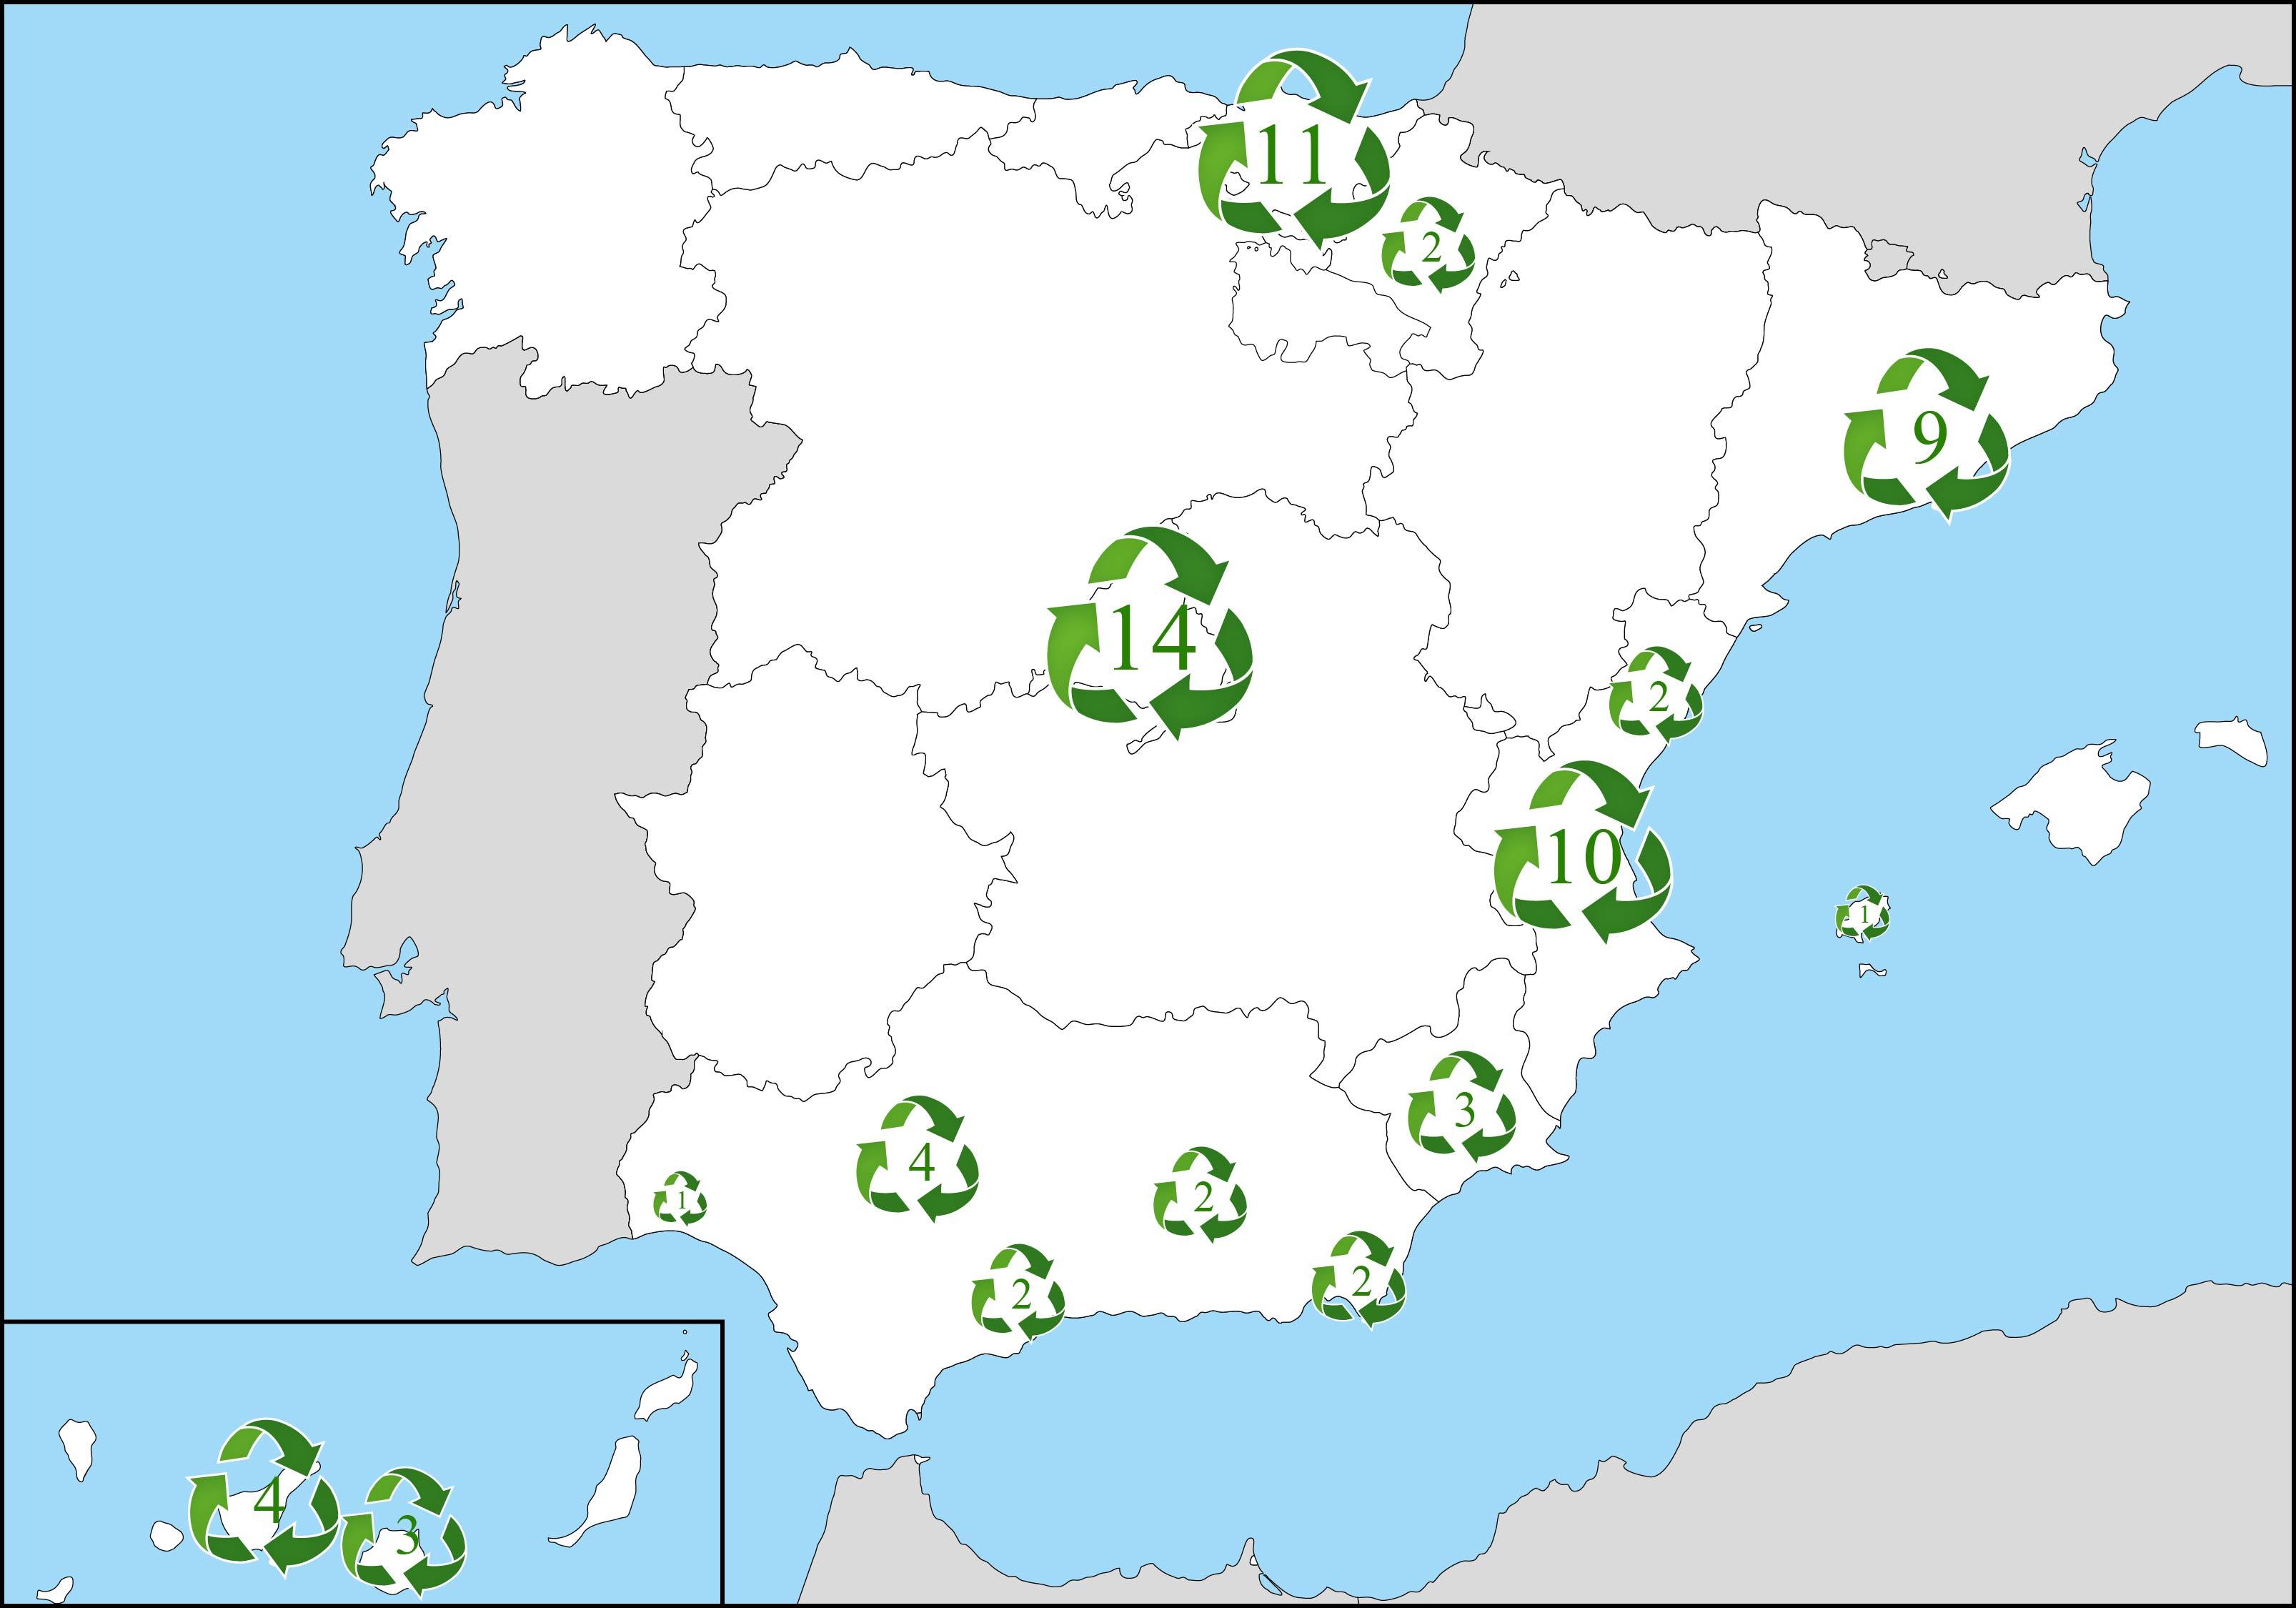 Es la arquitectura en espa a sostenible agua for La arquitectura en espana